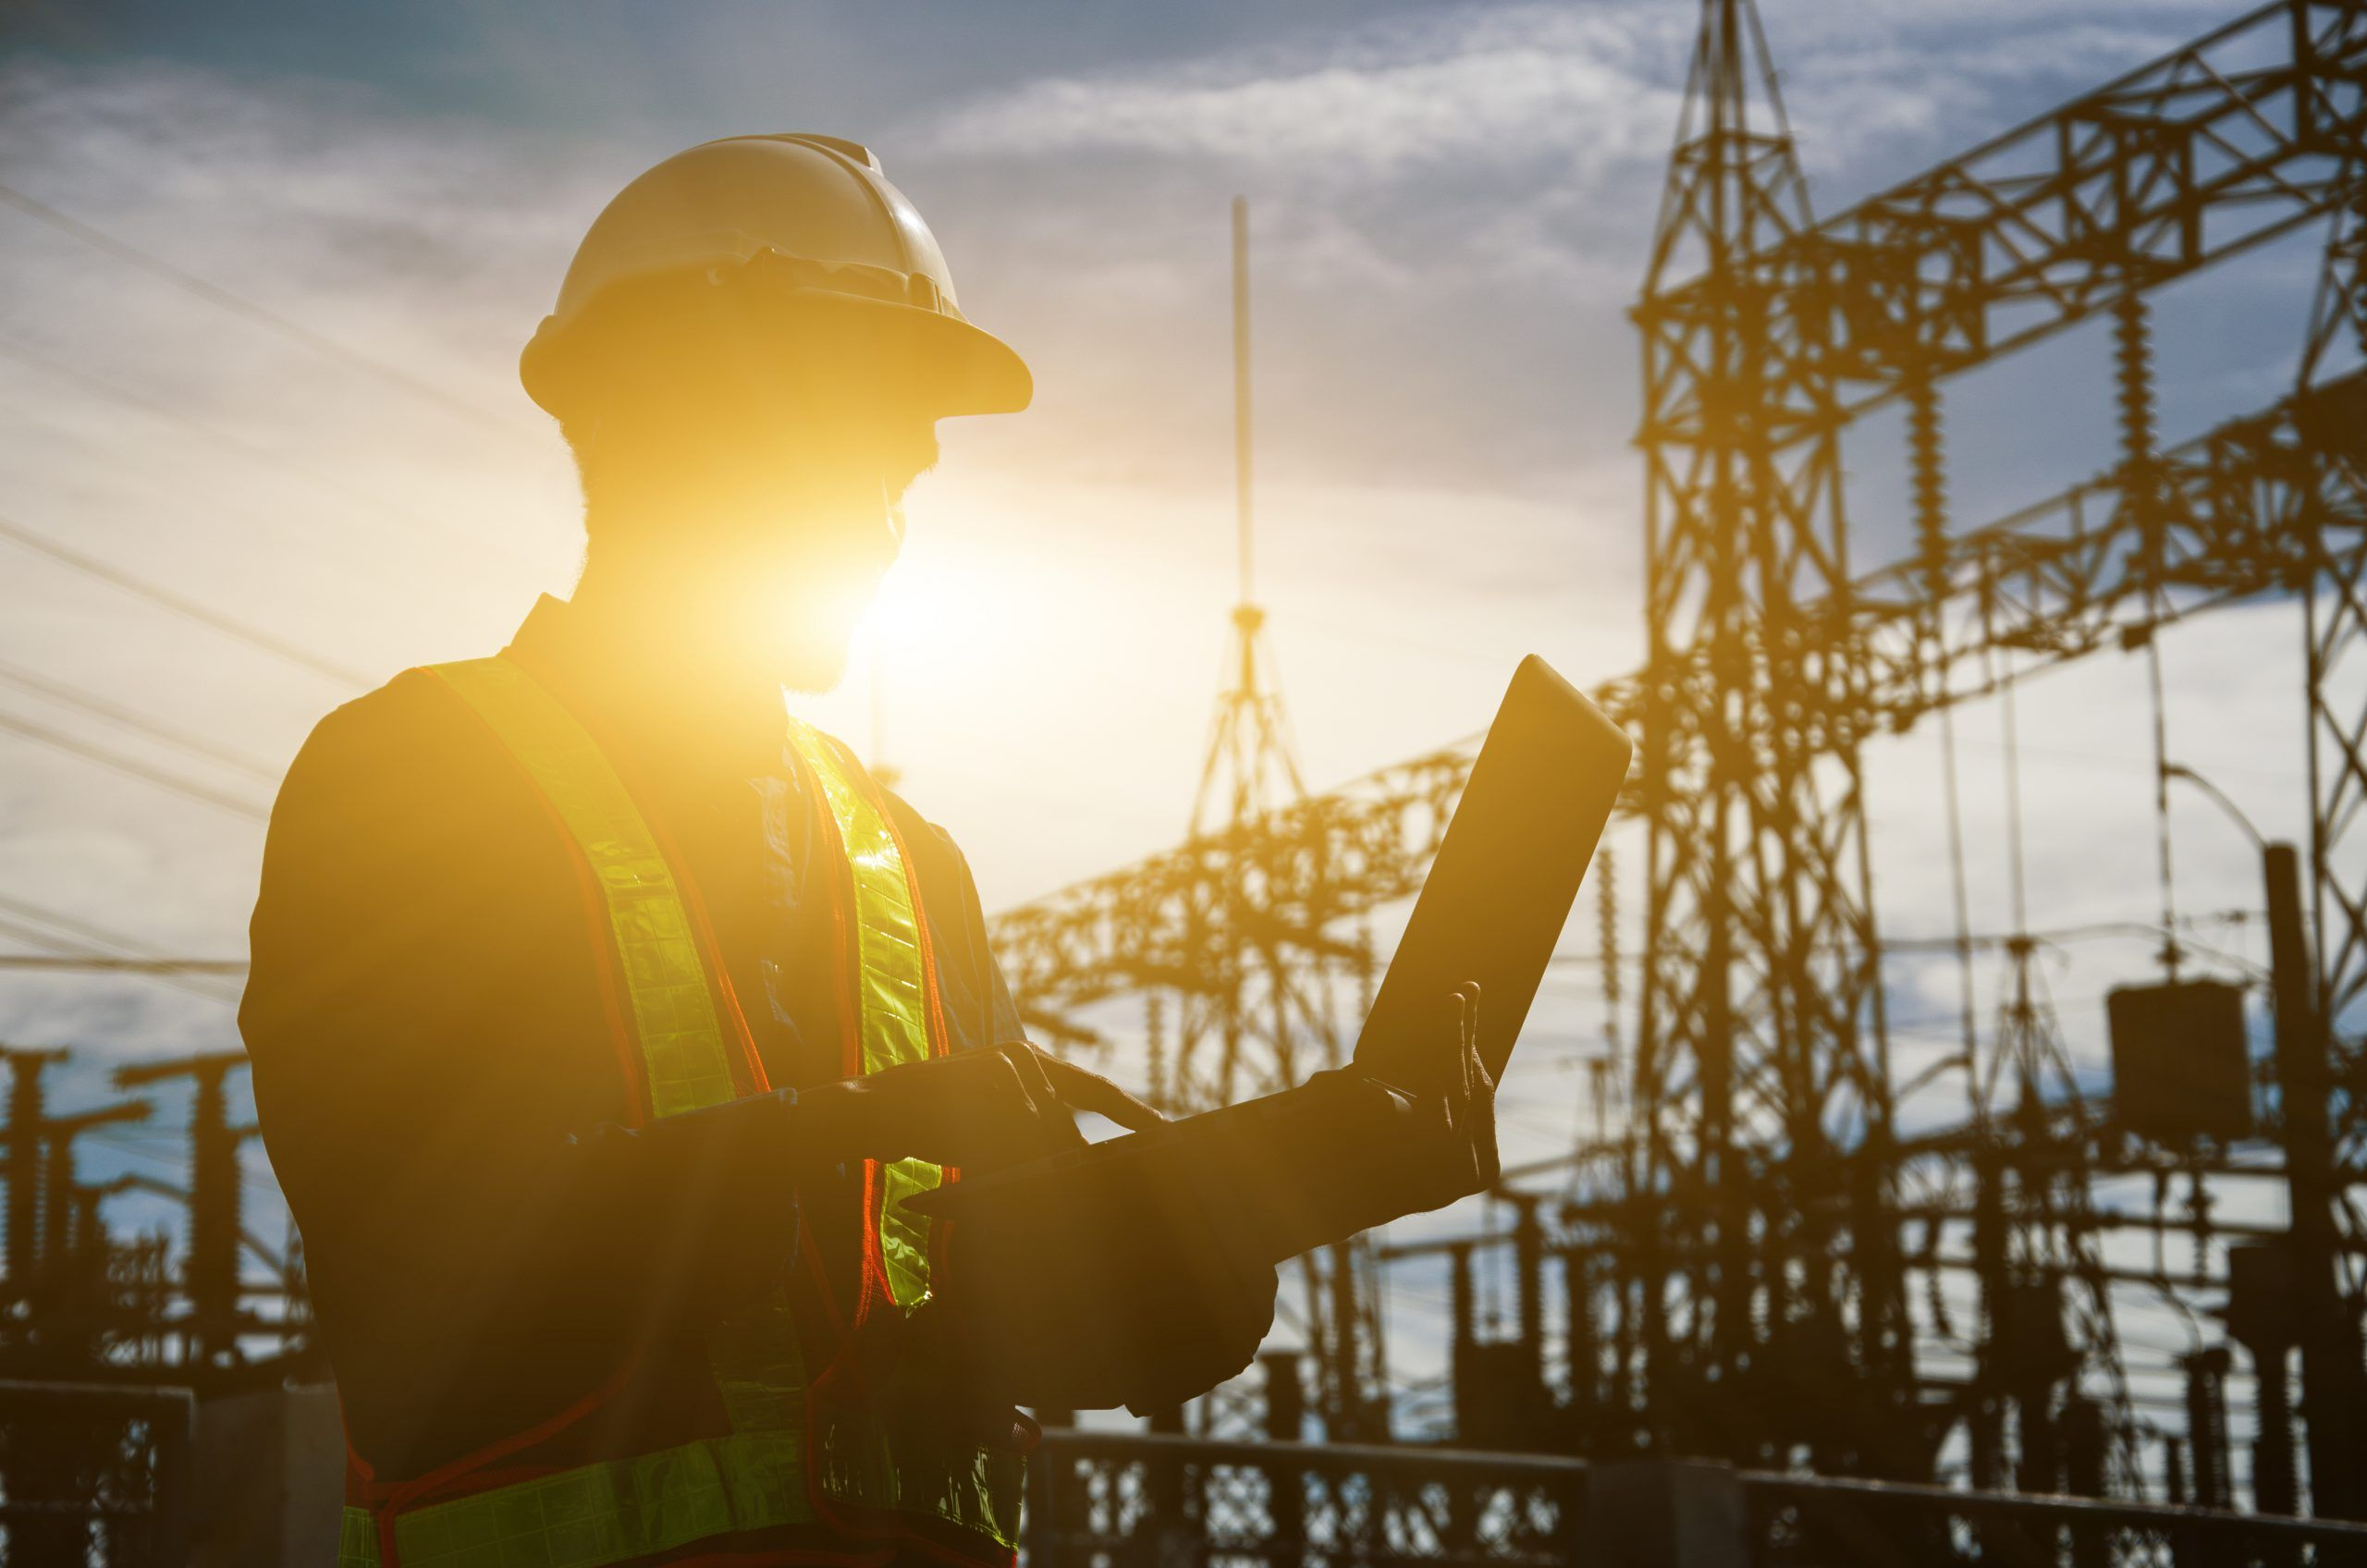 National infrastructure plan could strain CISA despite modernizing systems